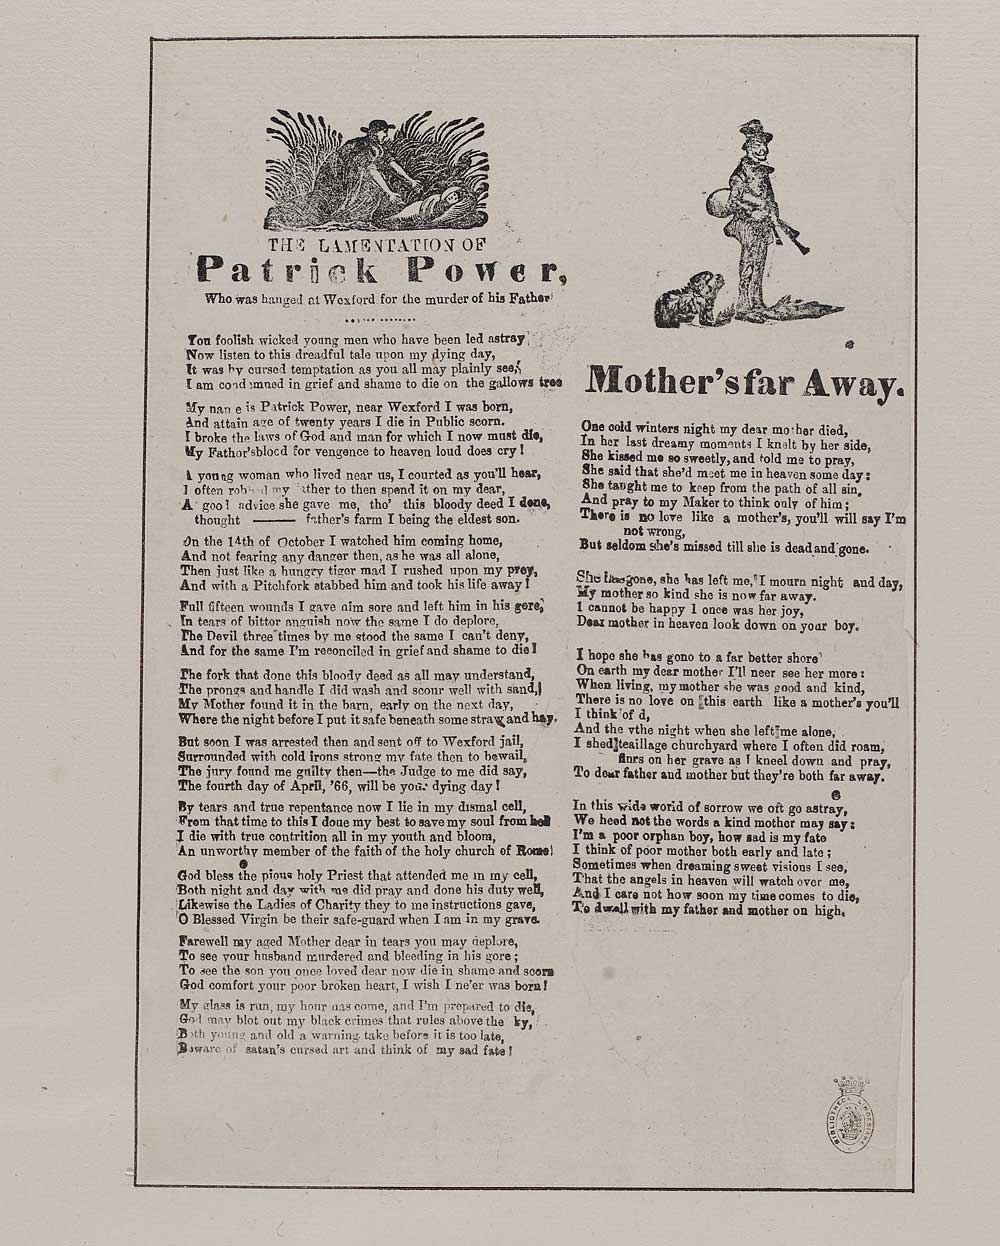 Lamentation of Patrick Power - Crime & punishment - English ballads